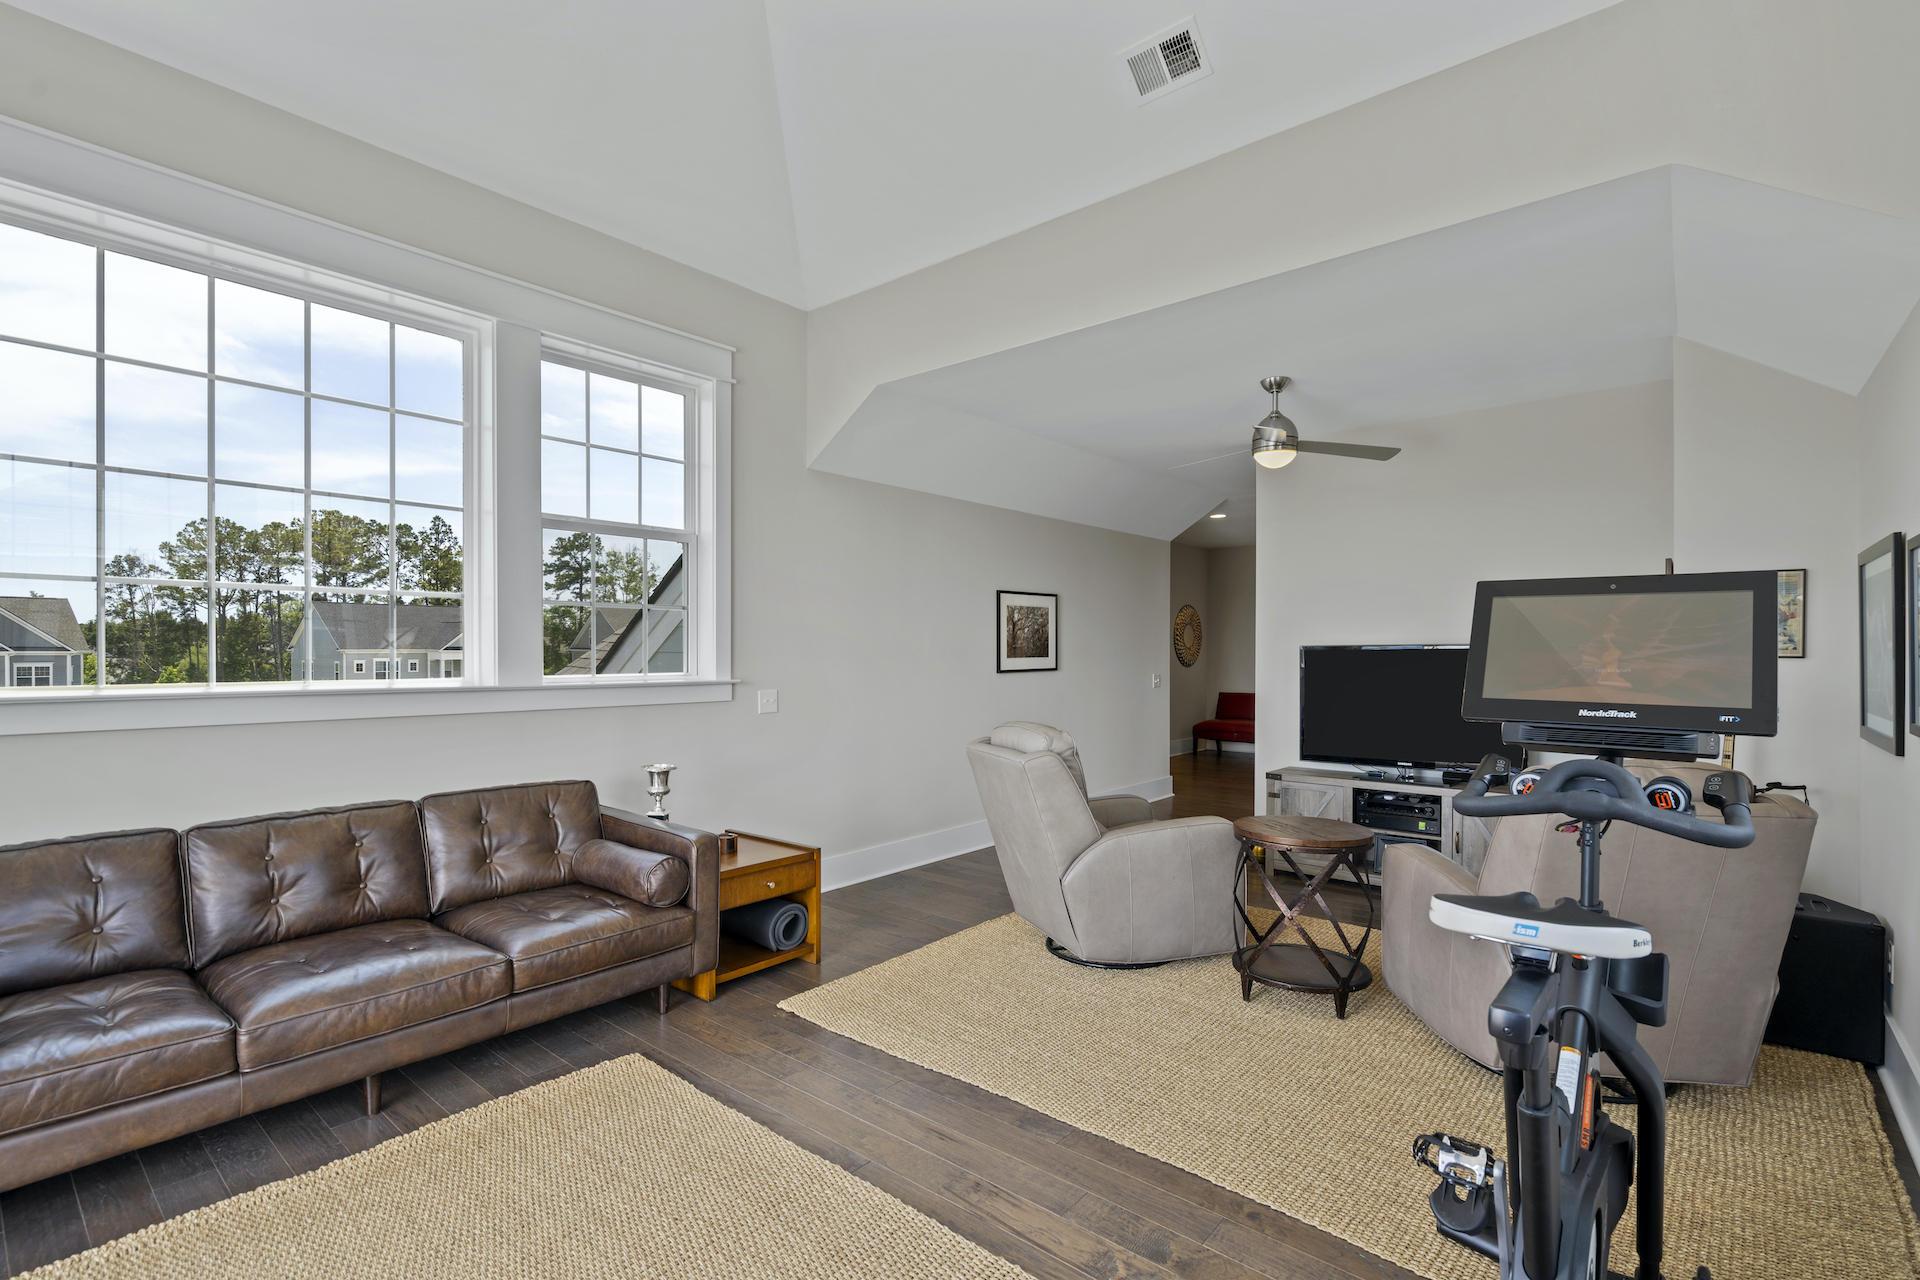 Dunes West Homes For Sale - 2316 Bucktail, Mount Pleasant, SC - 0